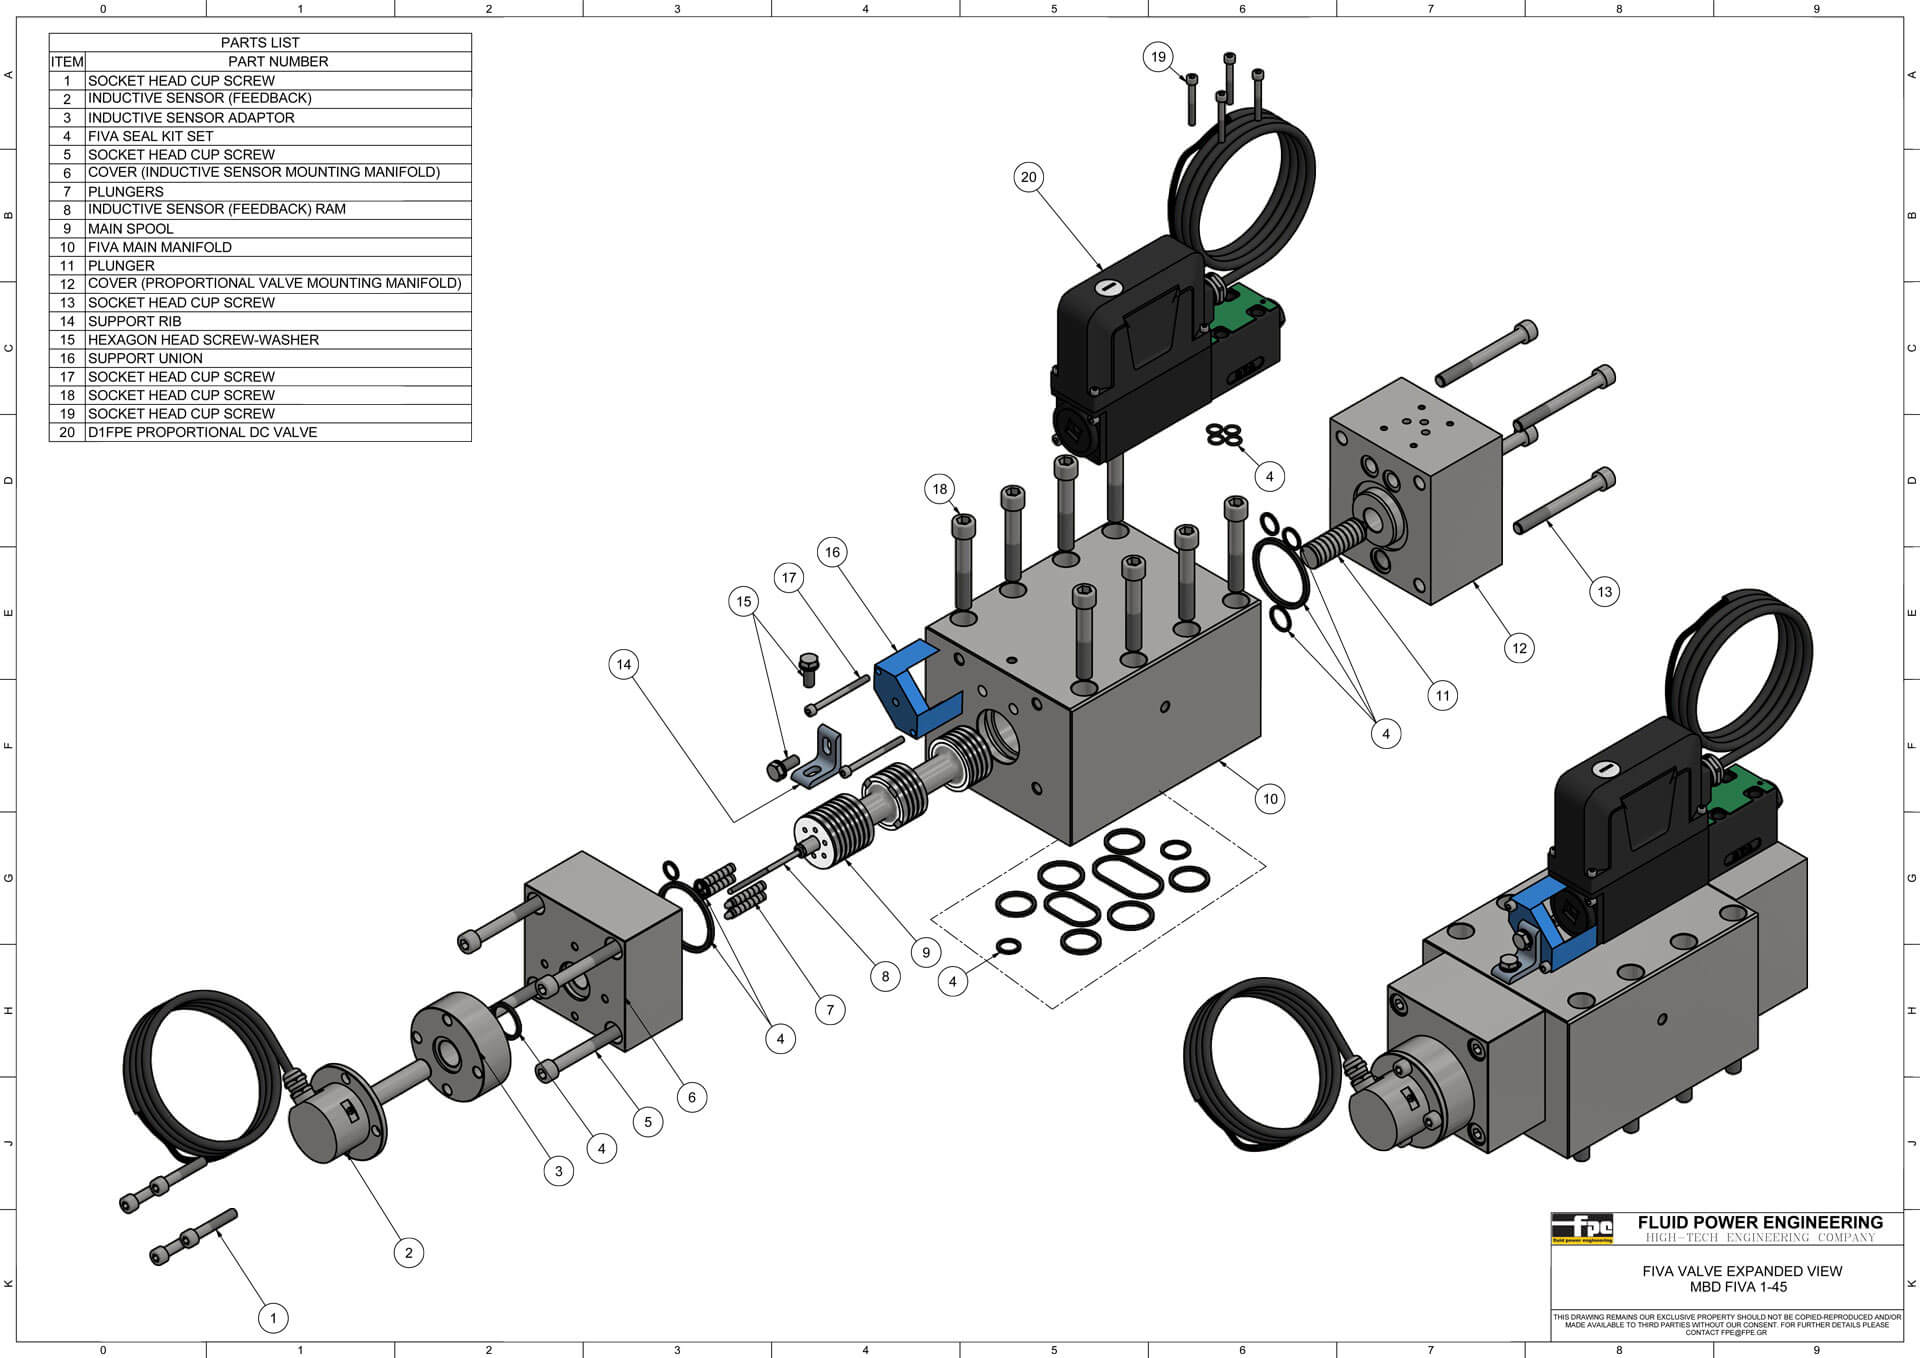 Fluid Power Engineering